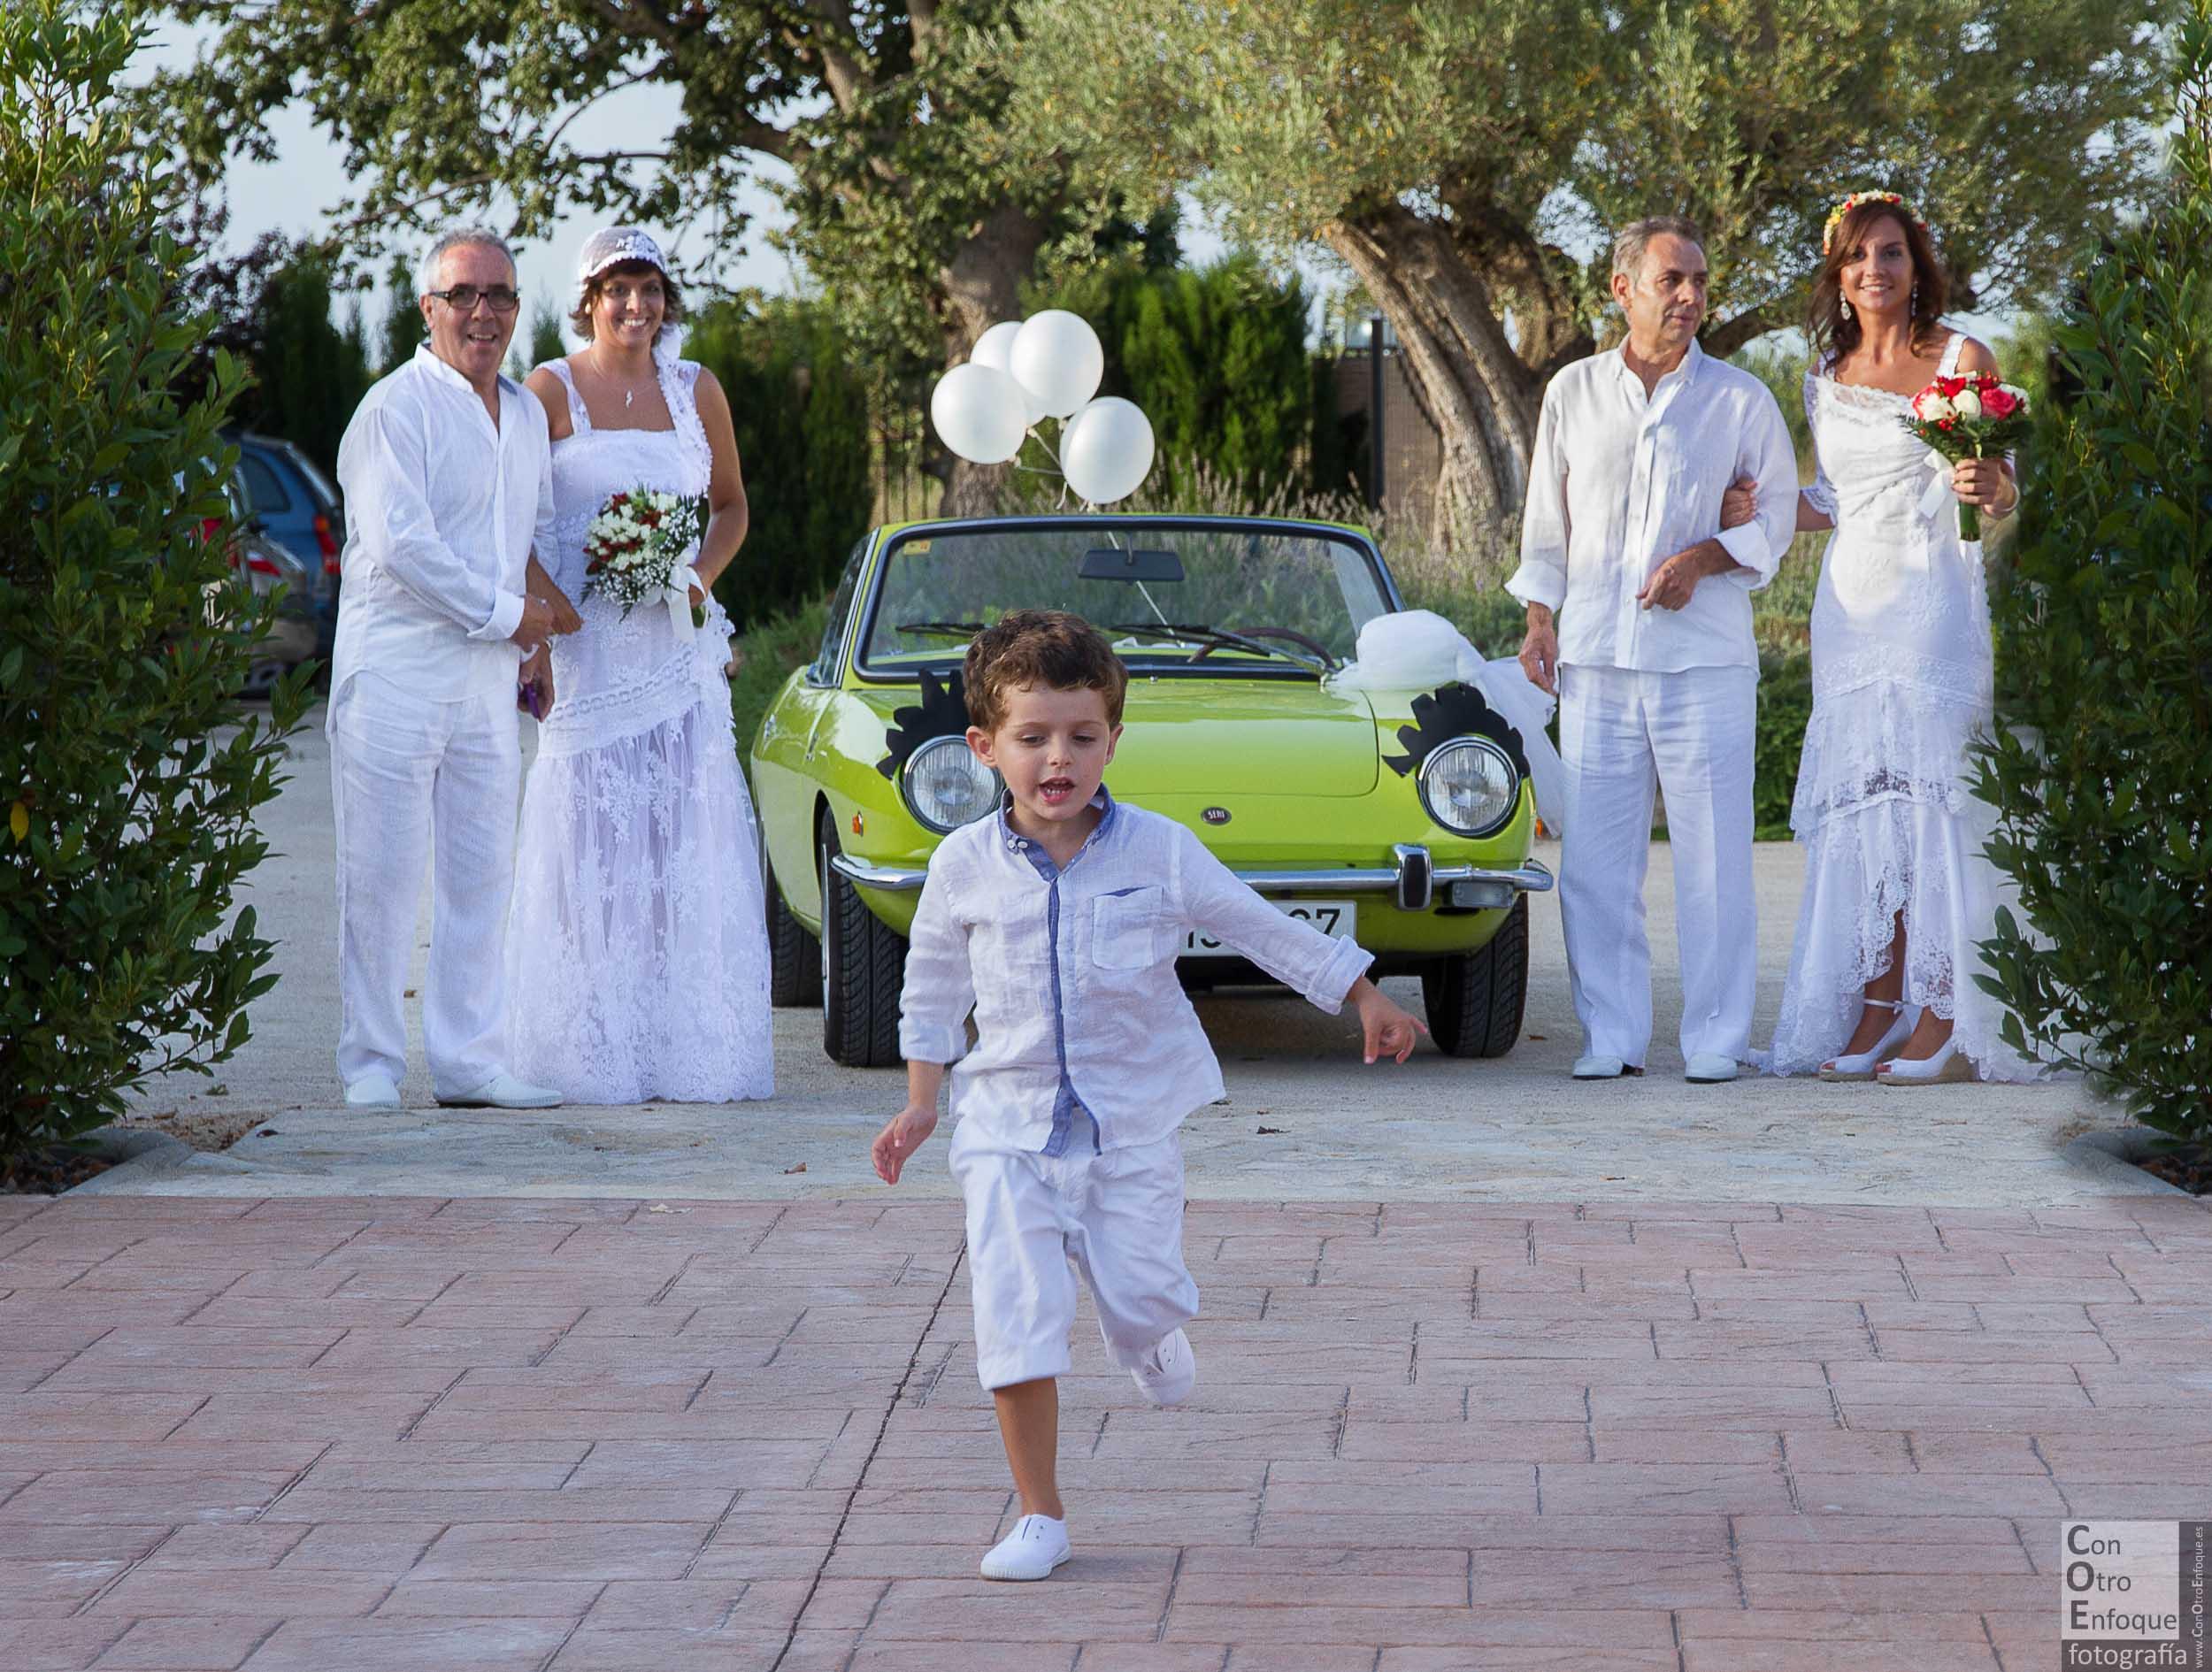 enamoradas. boda ibicenca-estilo-blanco-novias-coche clásico-coche antiguo-dos padrinos-wedding-gay-lesbian-boda lesbiana